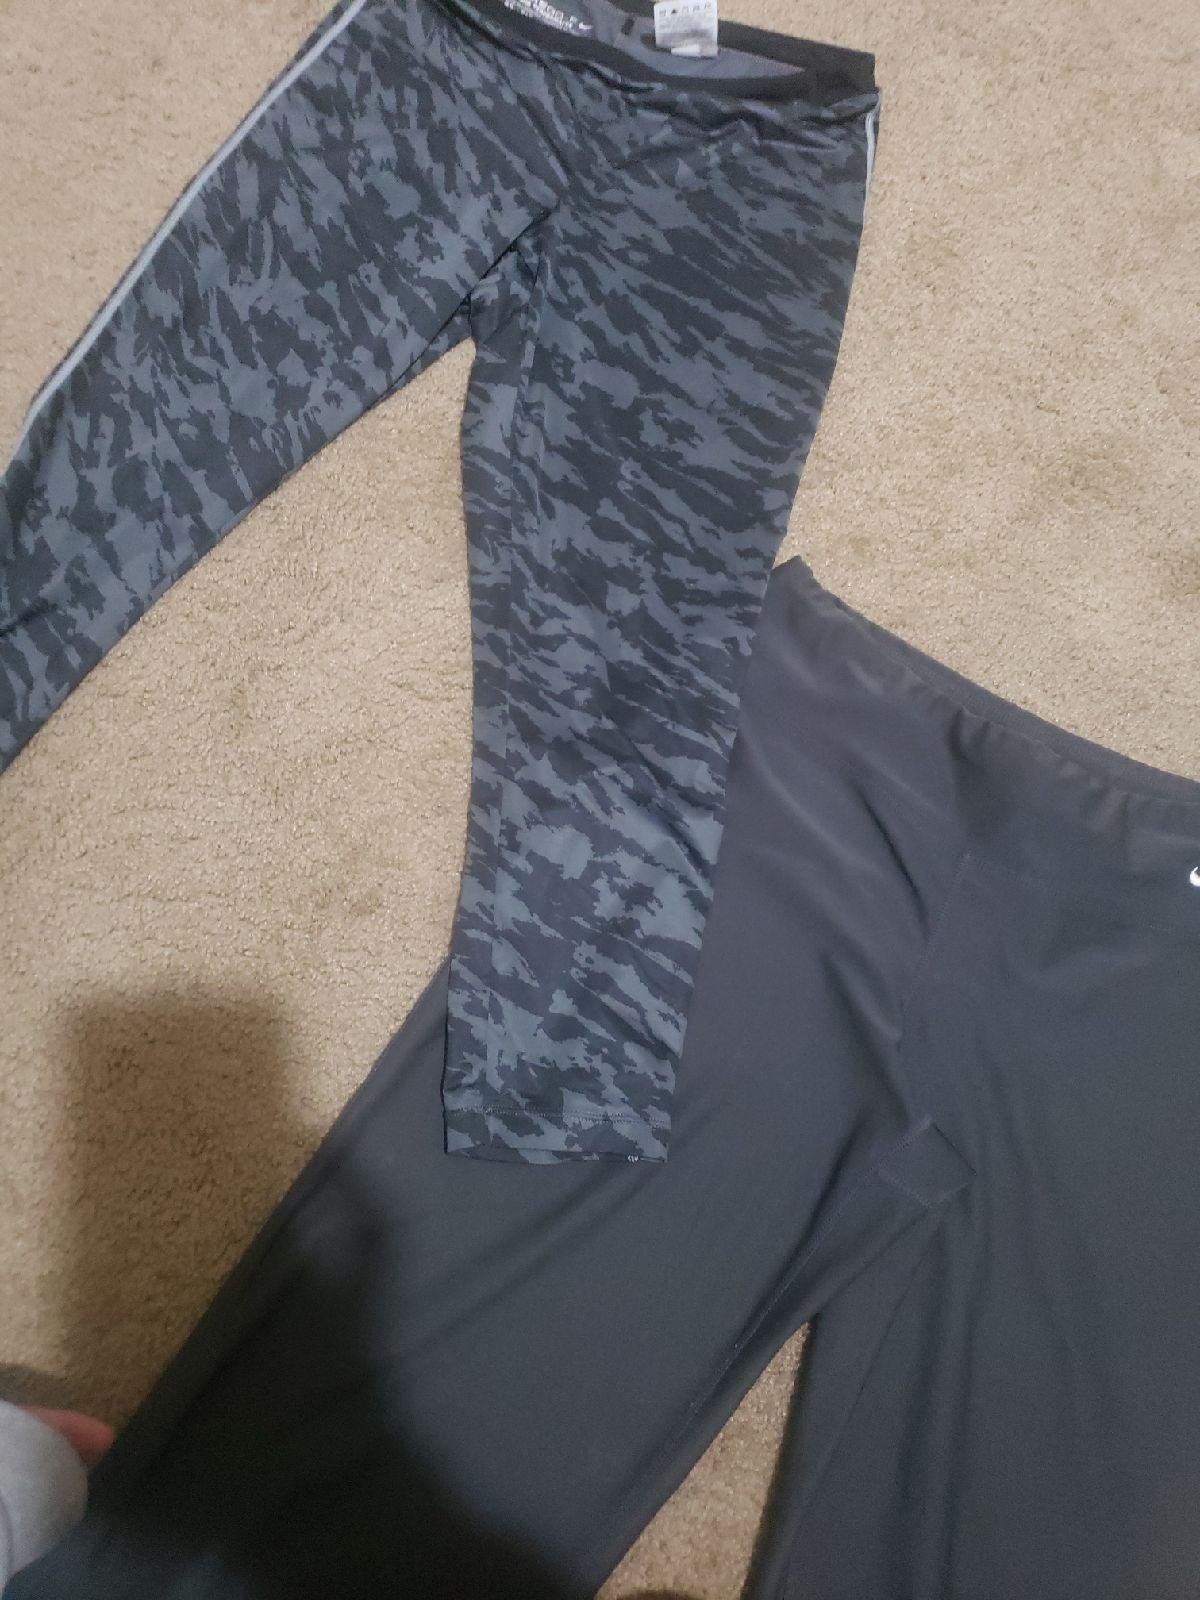 2 pairs of Nike leggings size S